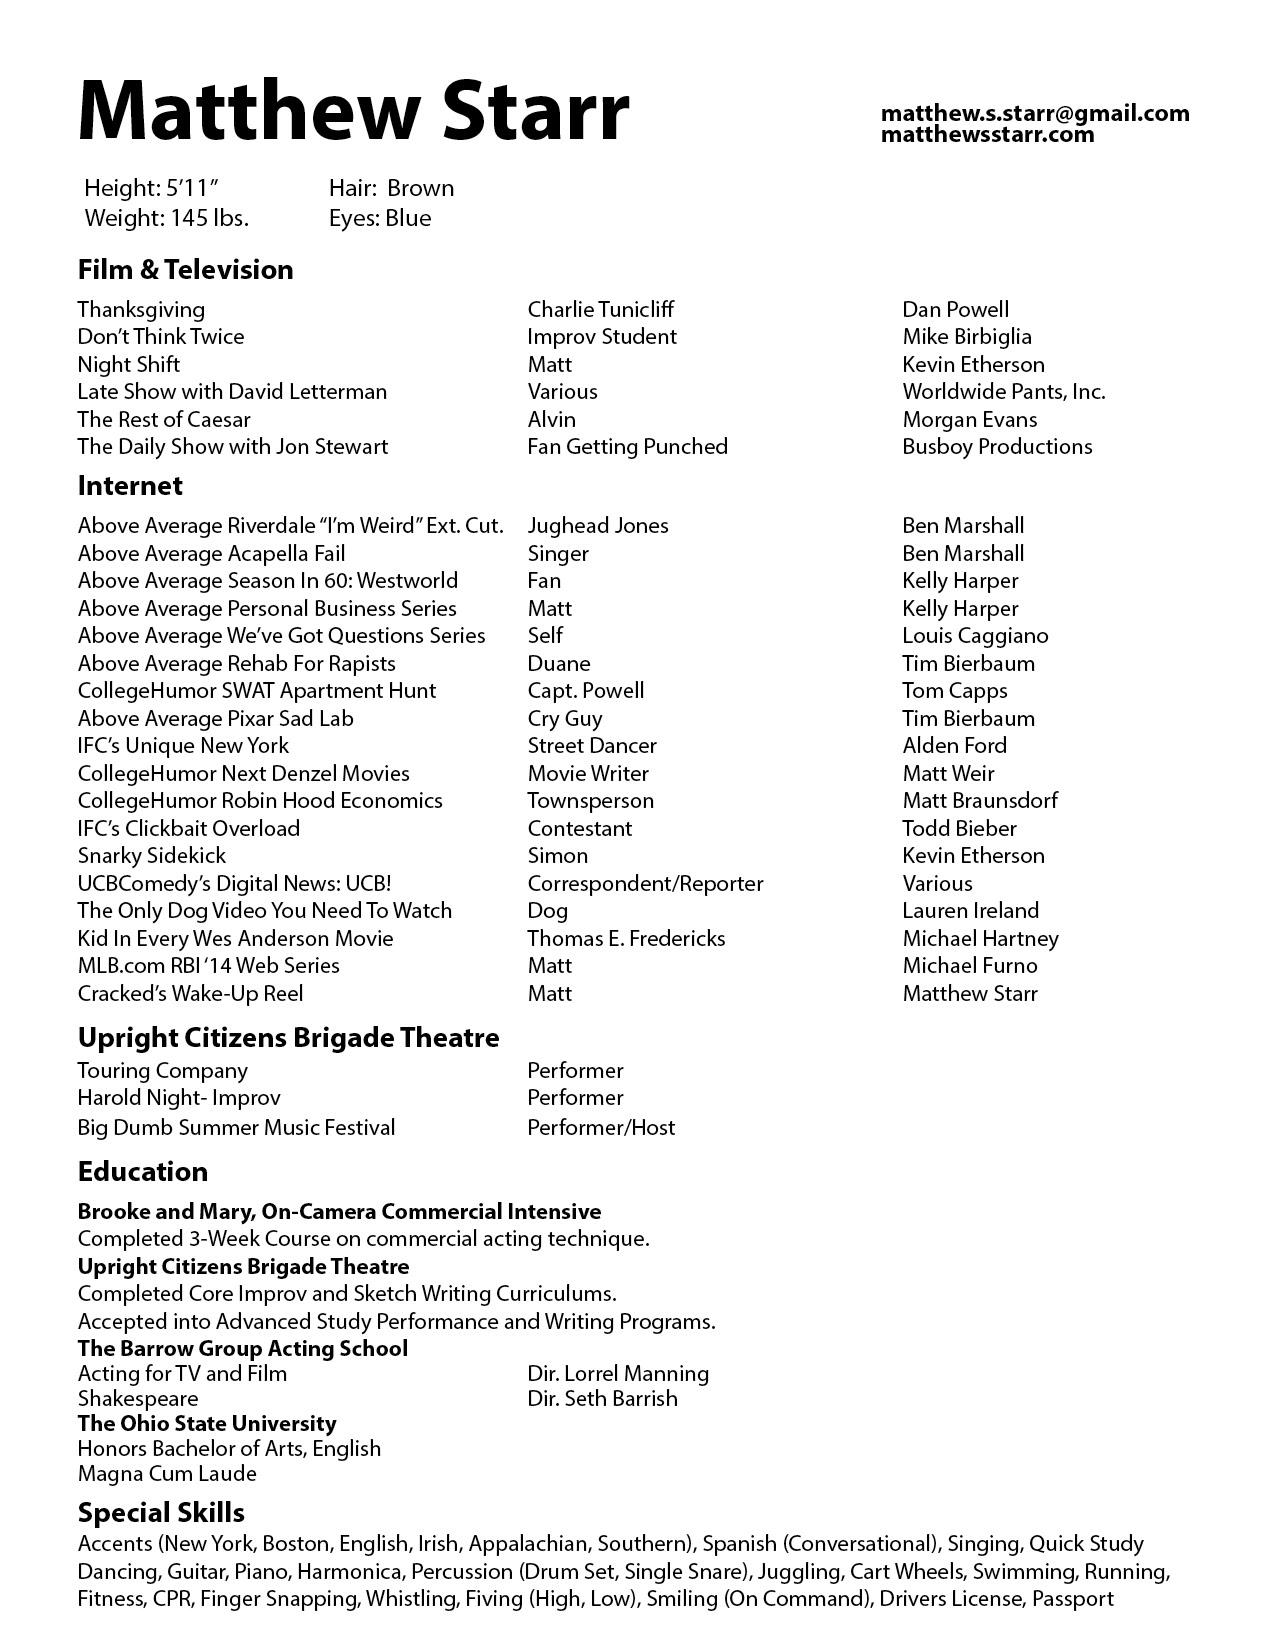 Matthew Starr Acting Resume Oct. 2017.jpg